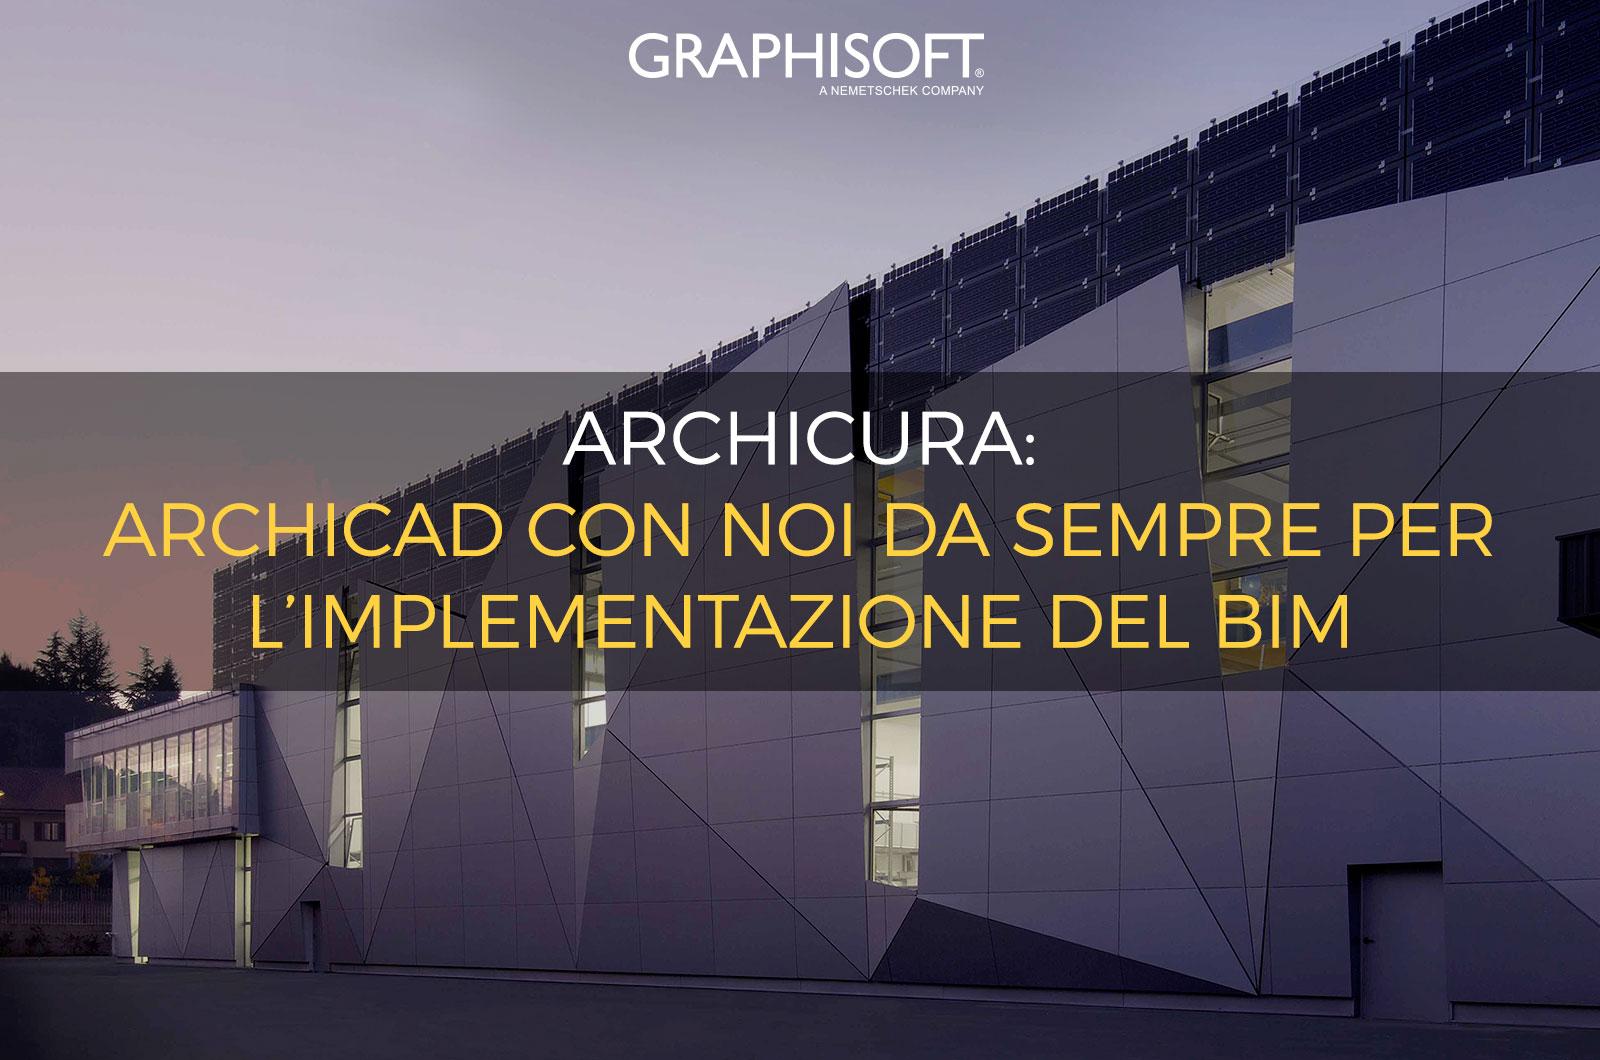 GRAPHISOFT_archicura